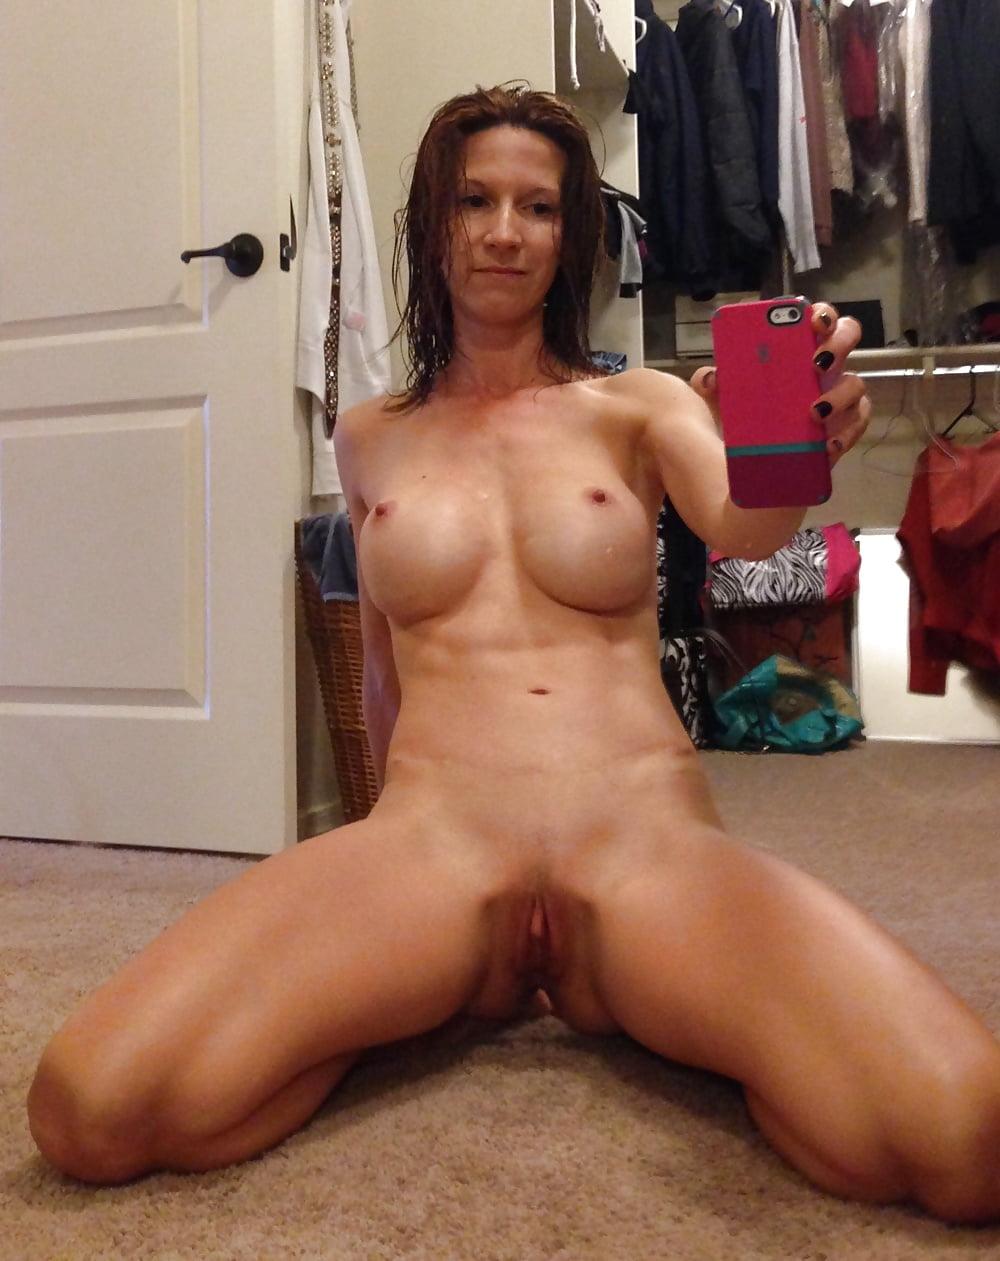 Mature milf self nude — photo 14